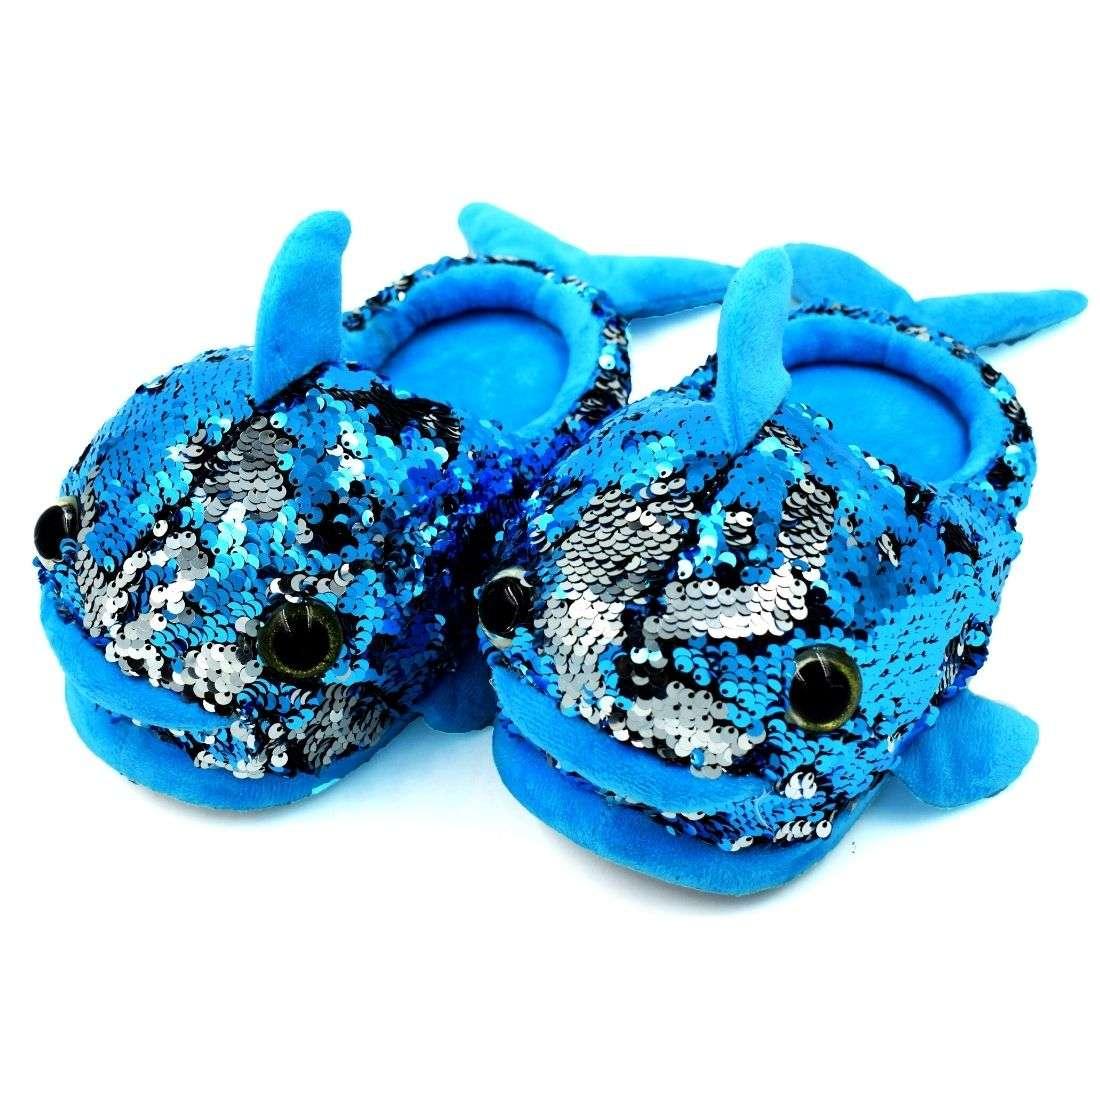 Mermaid Plush Slipper Blue